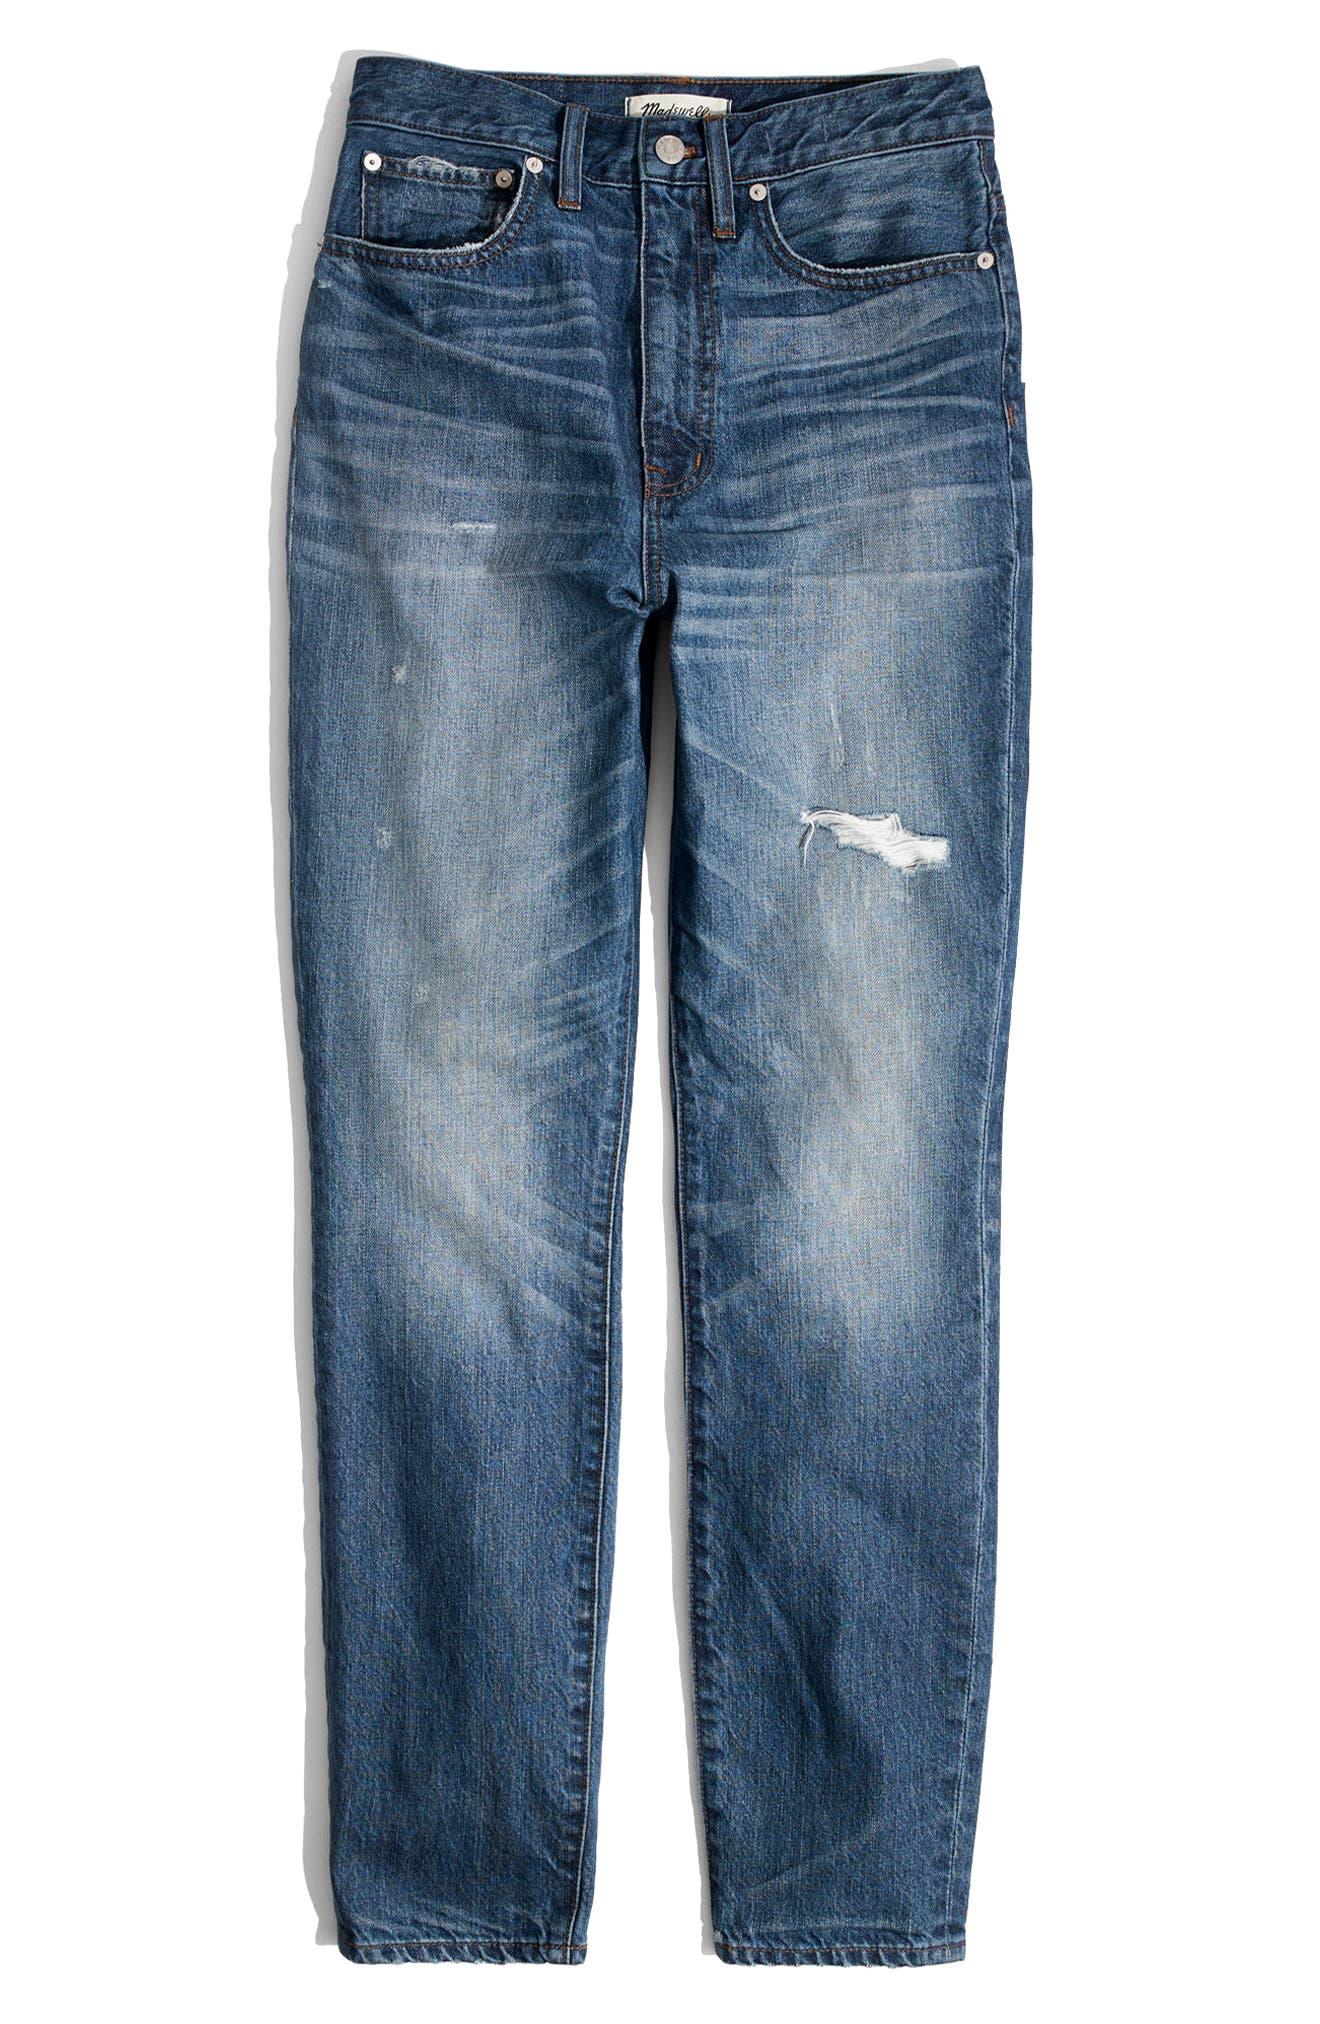 MADEWELL, Rigid High Waist Skinny Jeans, Alternate thumbnail 5, color, NAPA